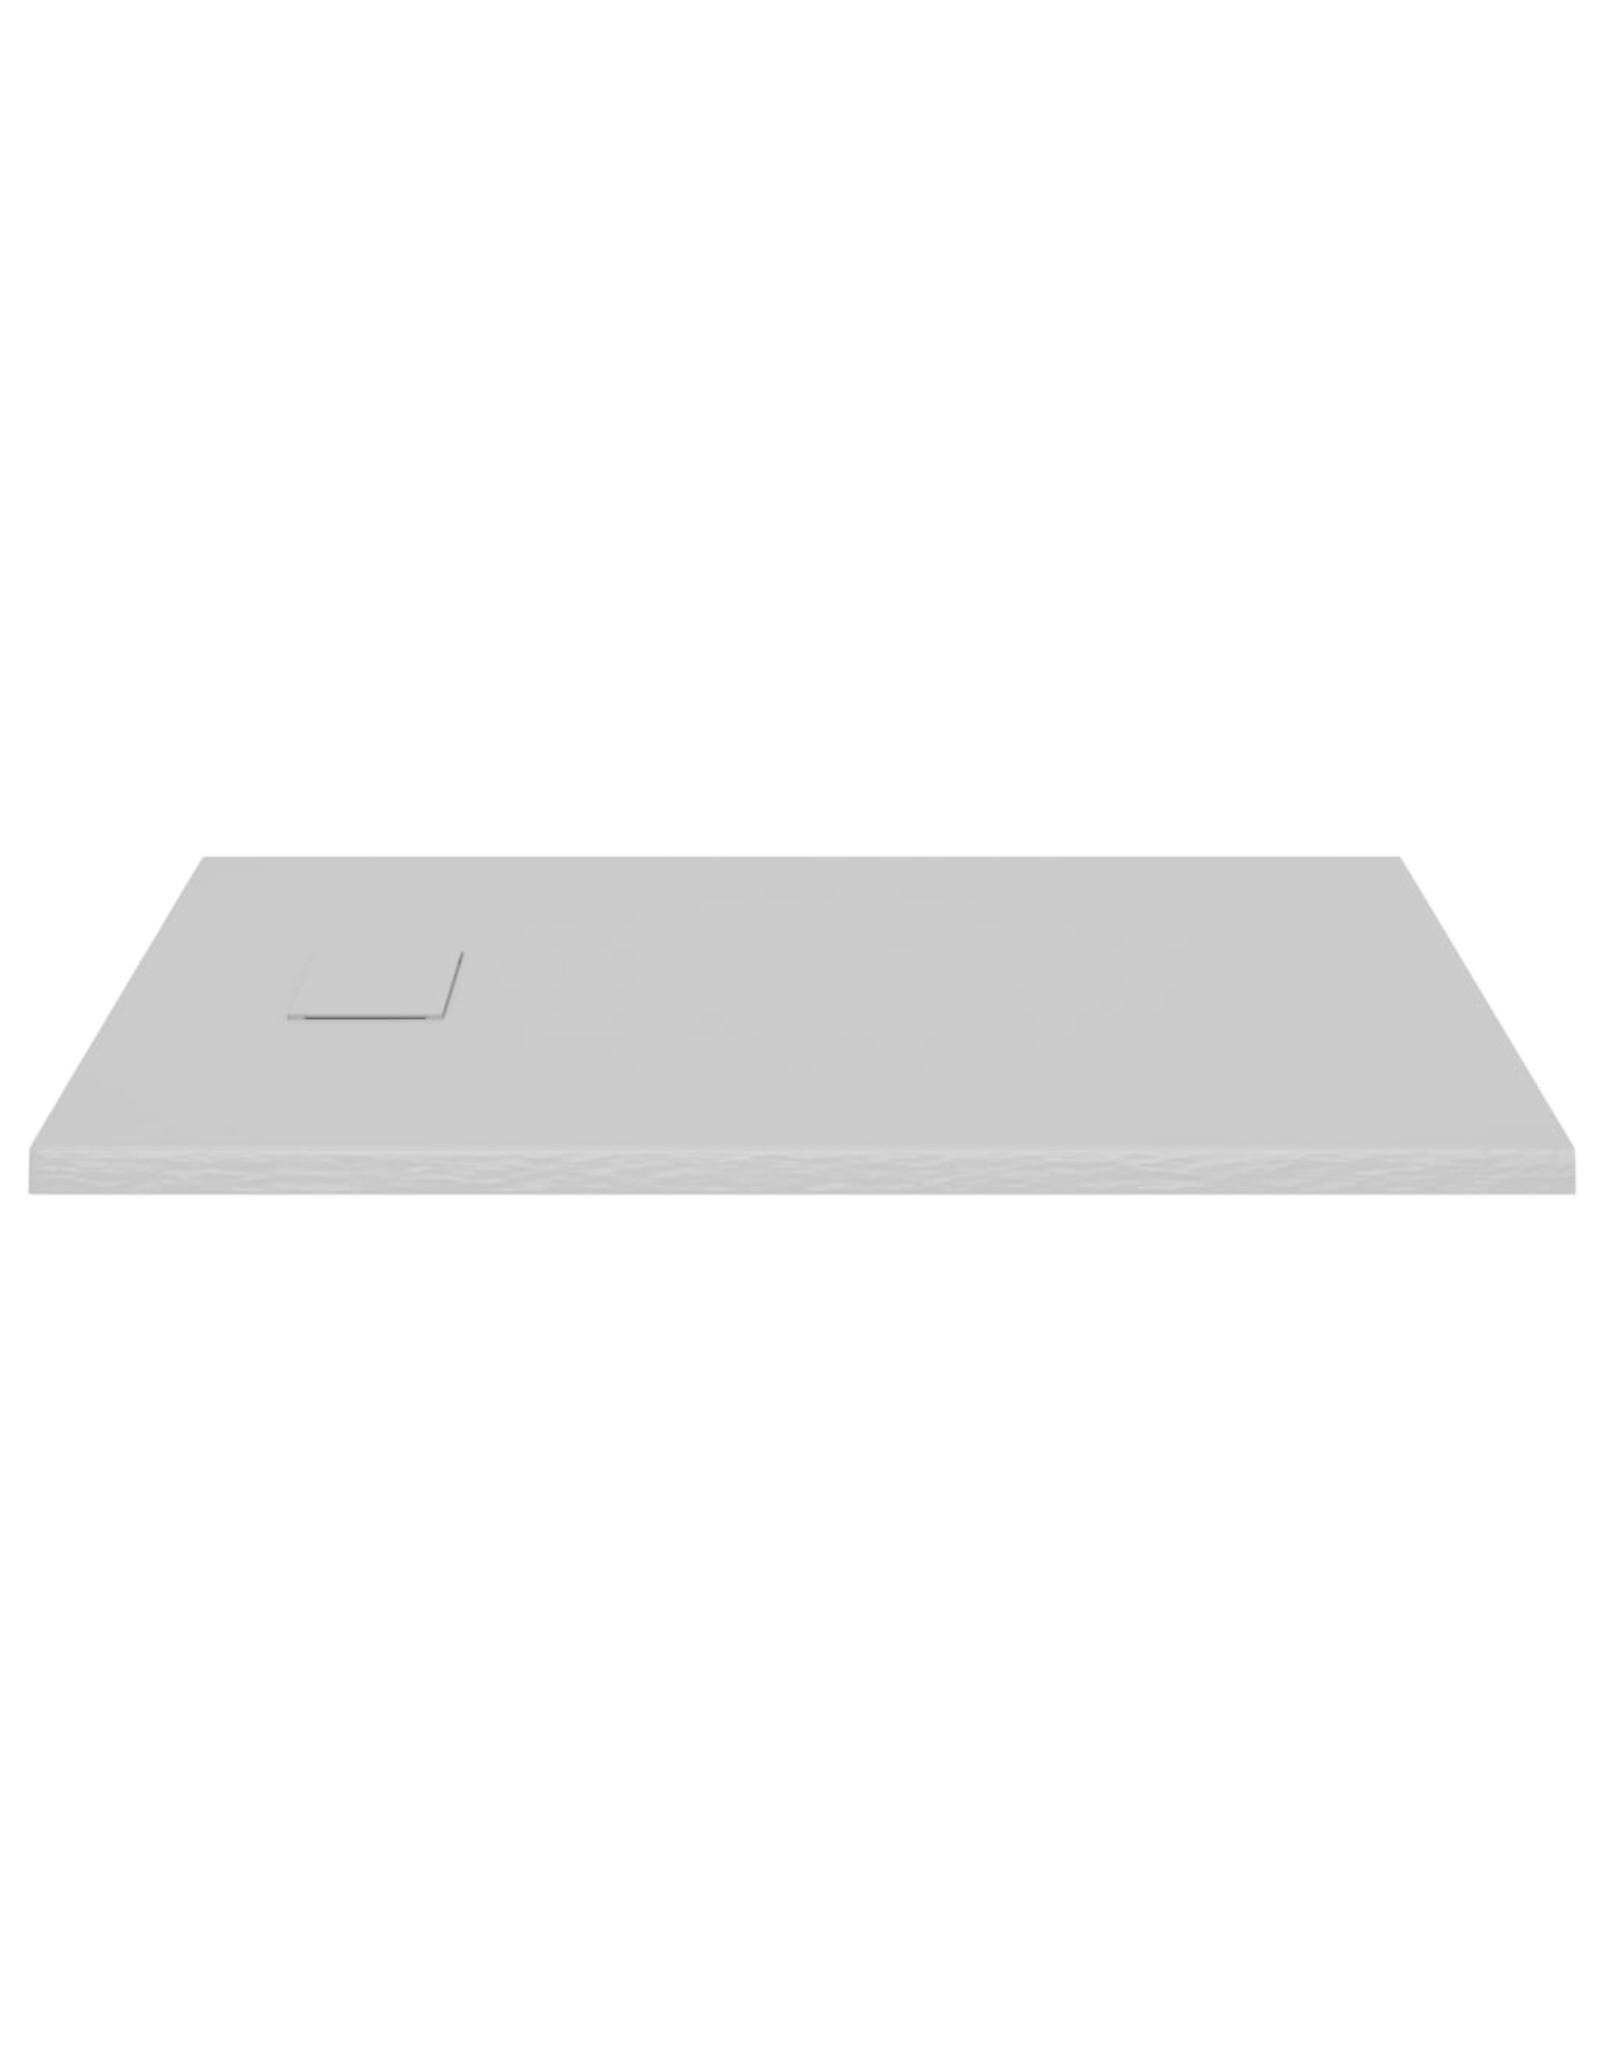 Douchebak 100x80 cm SMC grijs